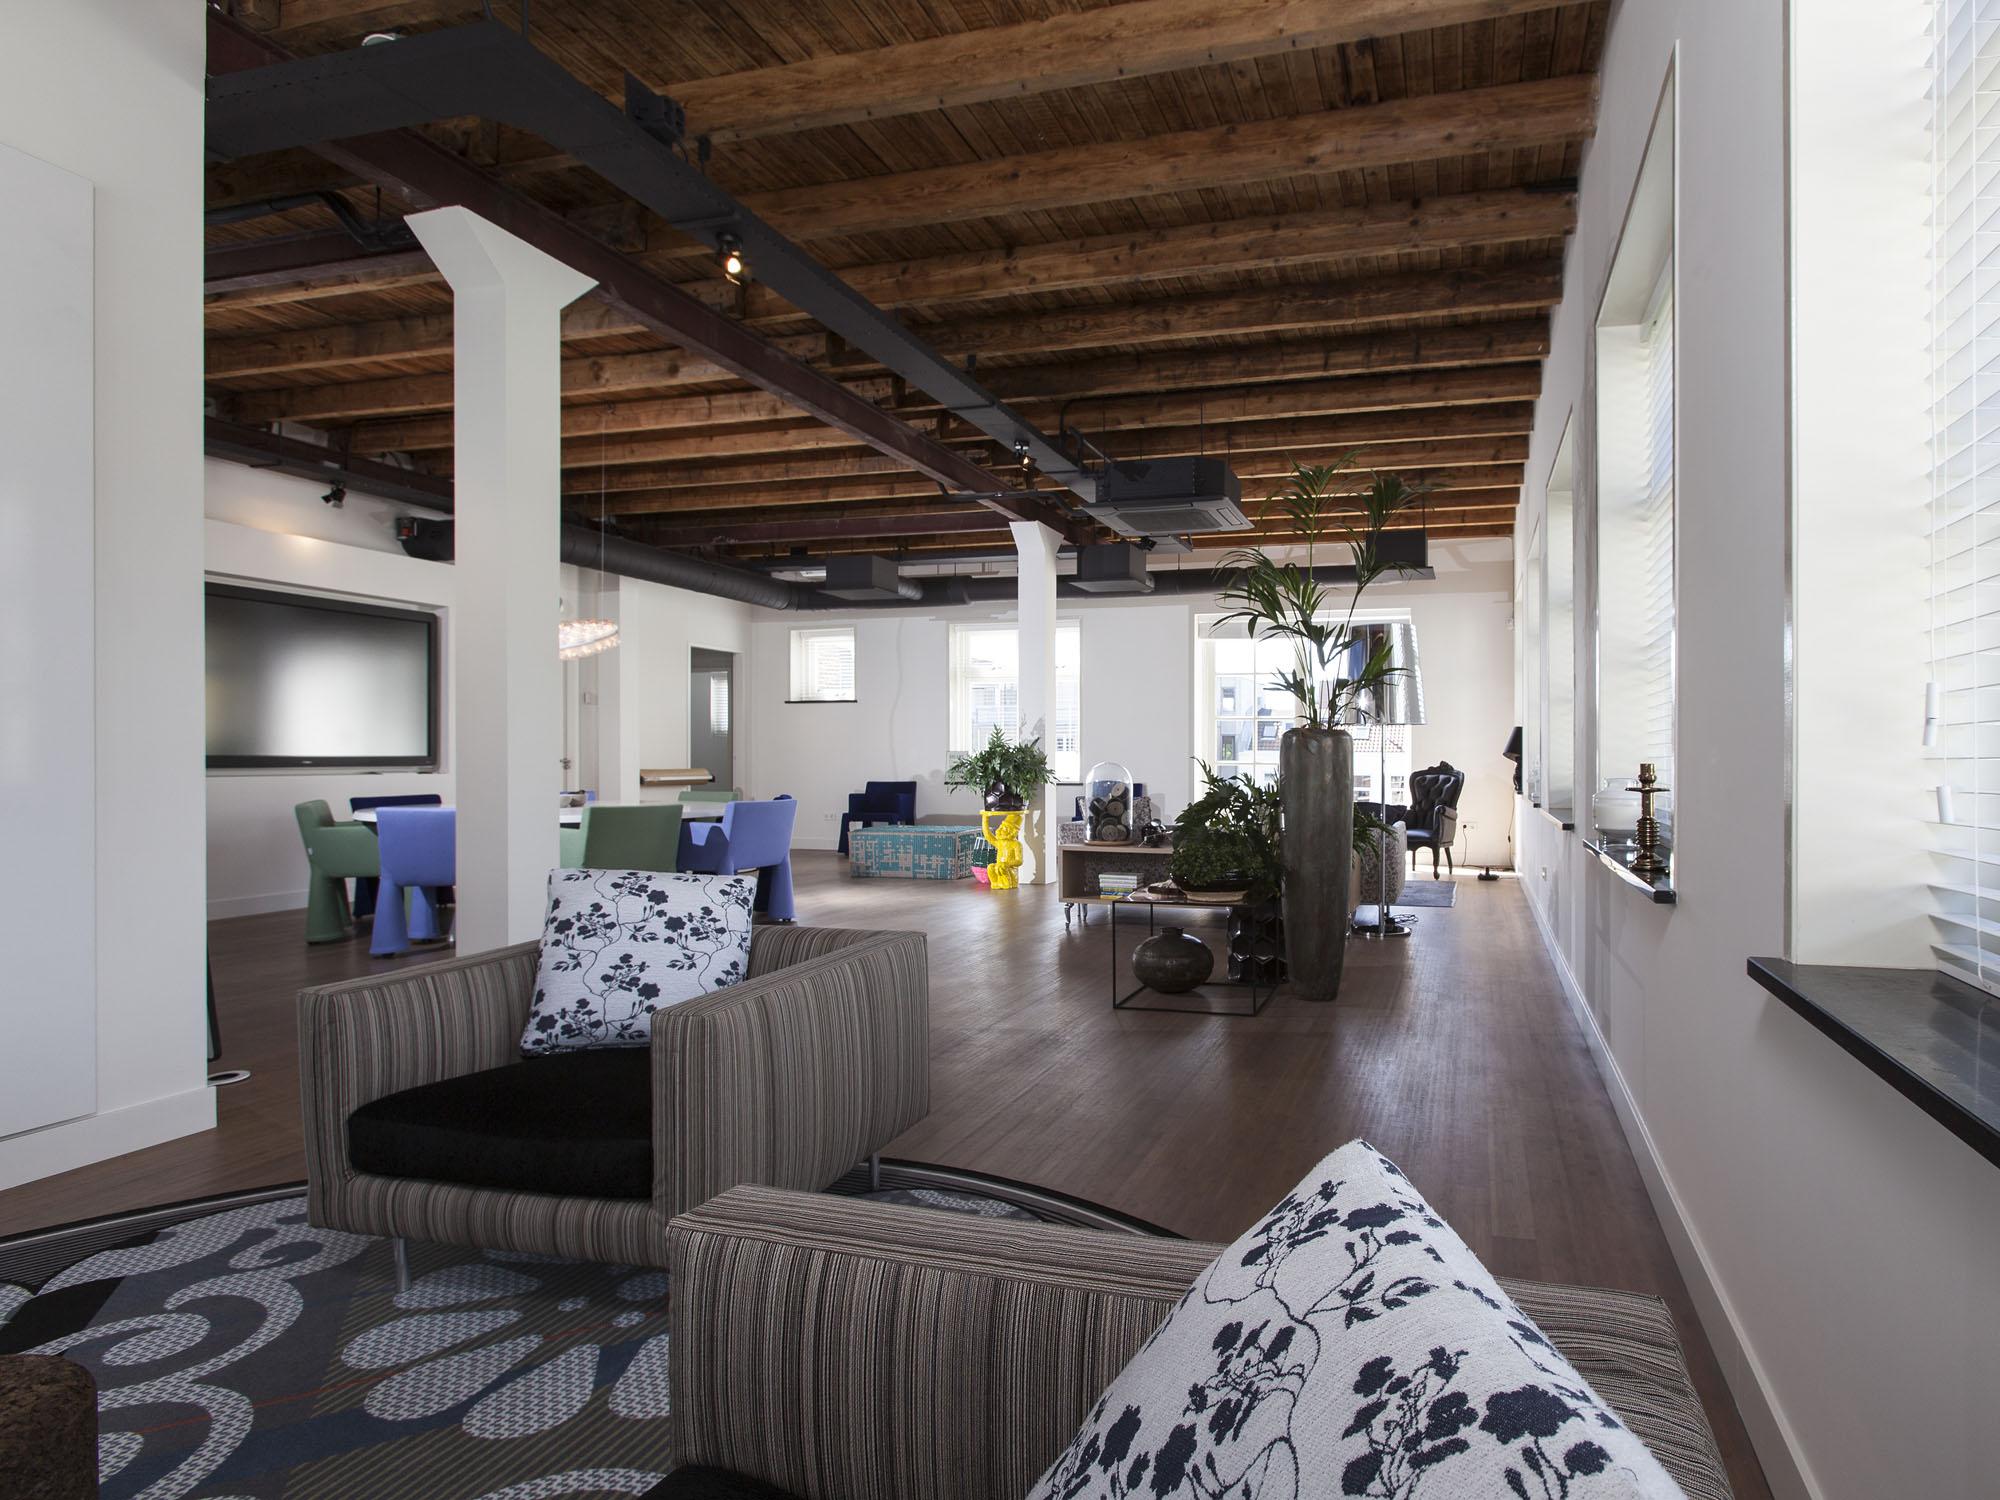 studio-hermanides-loft-office-2.jpg